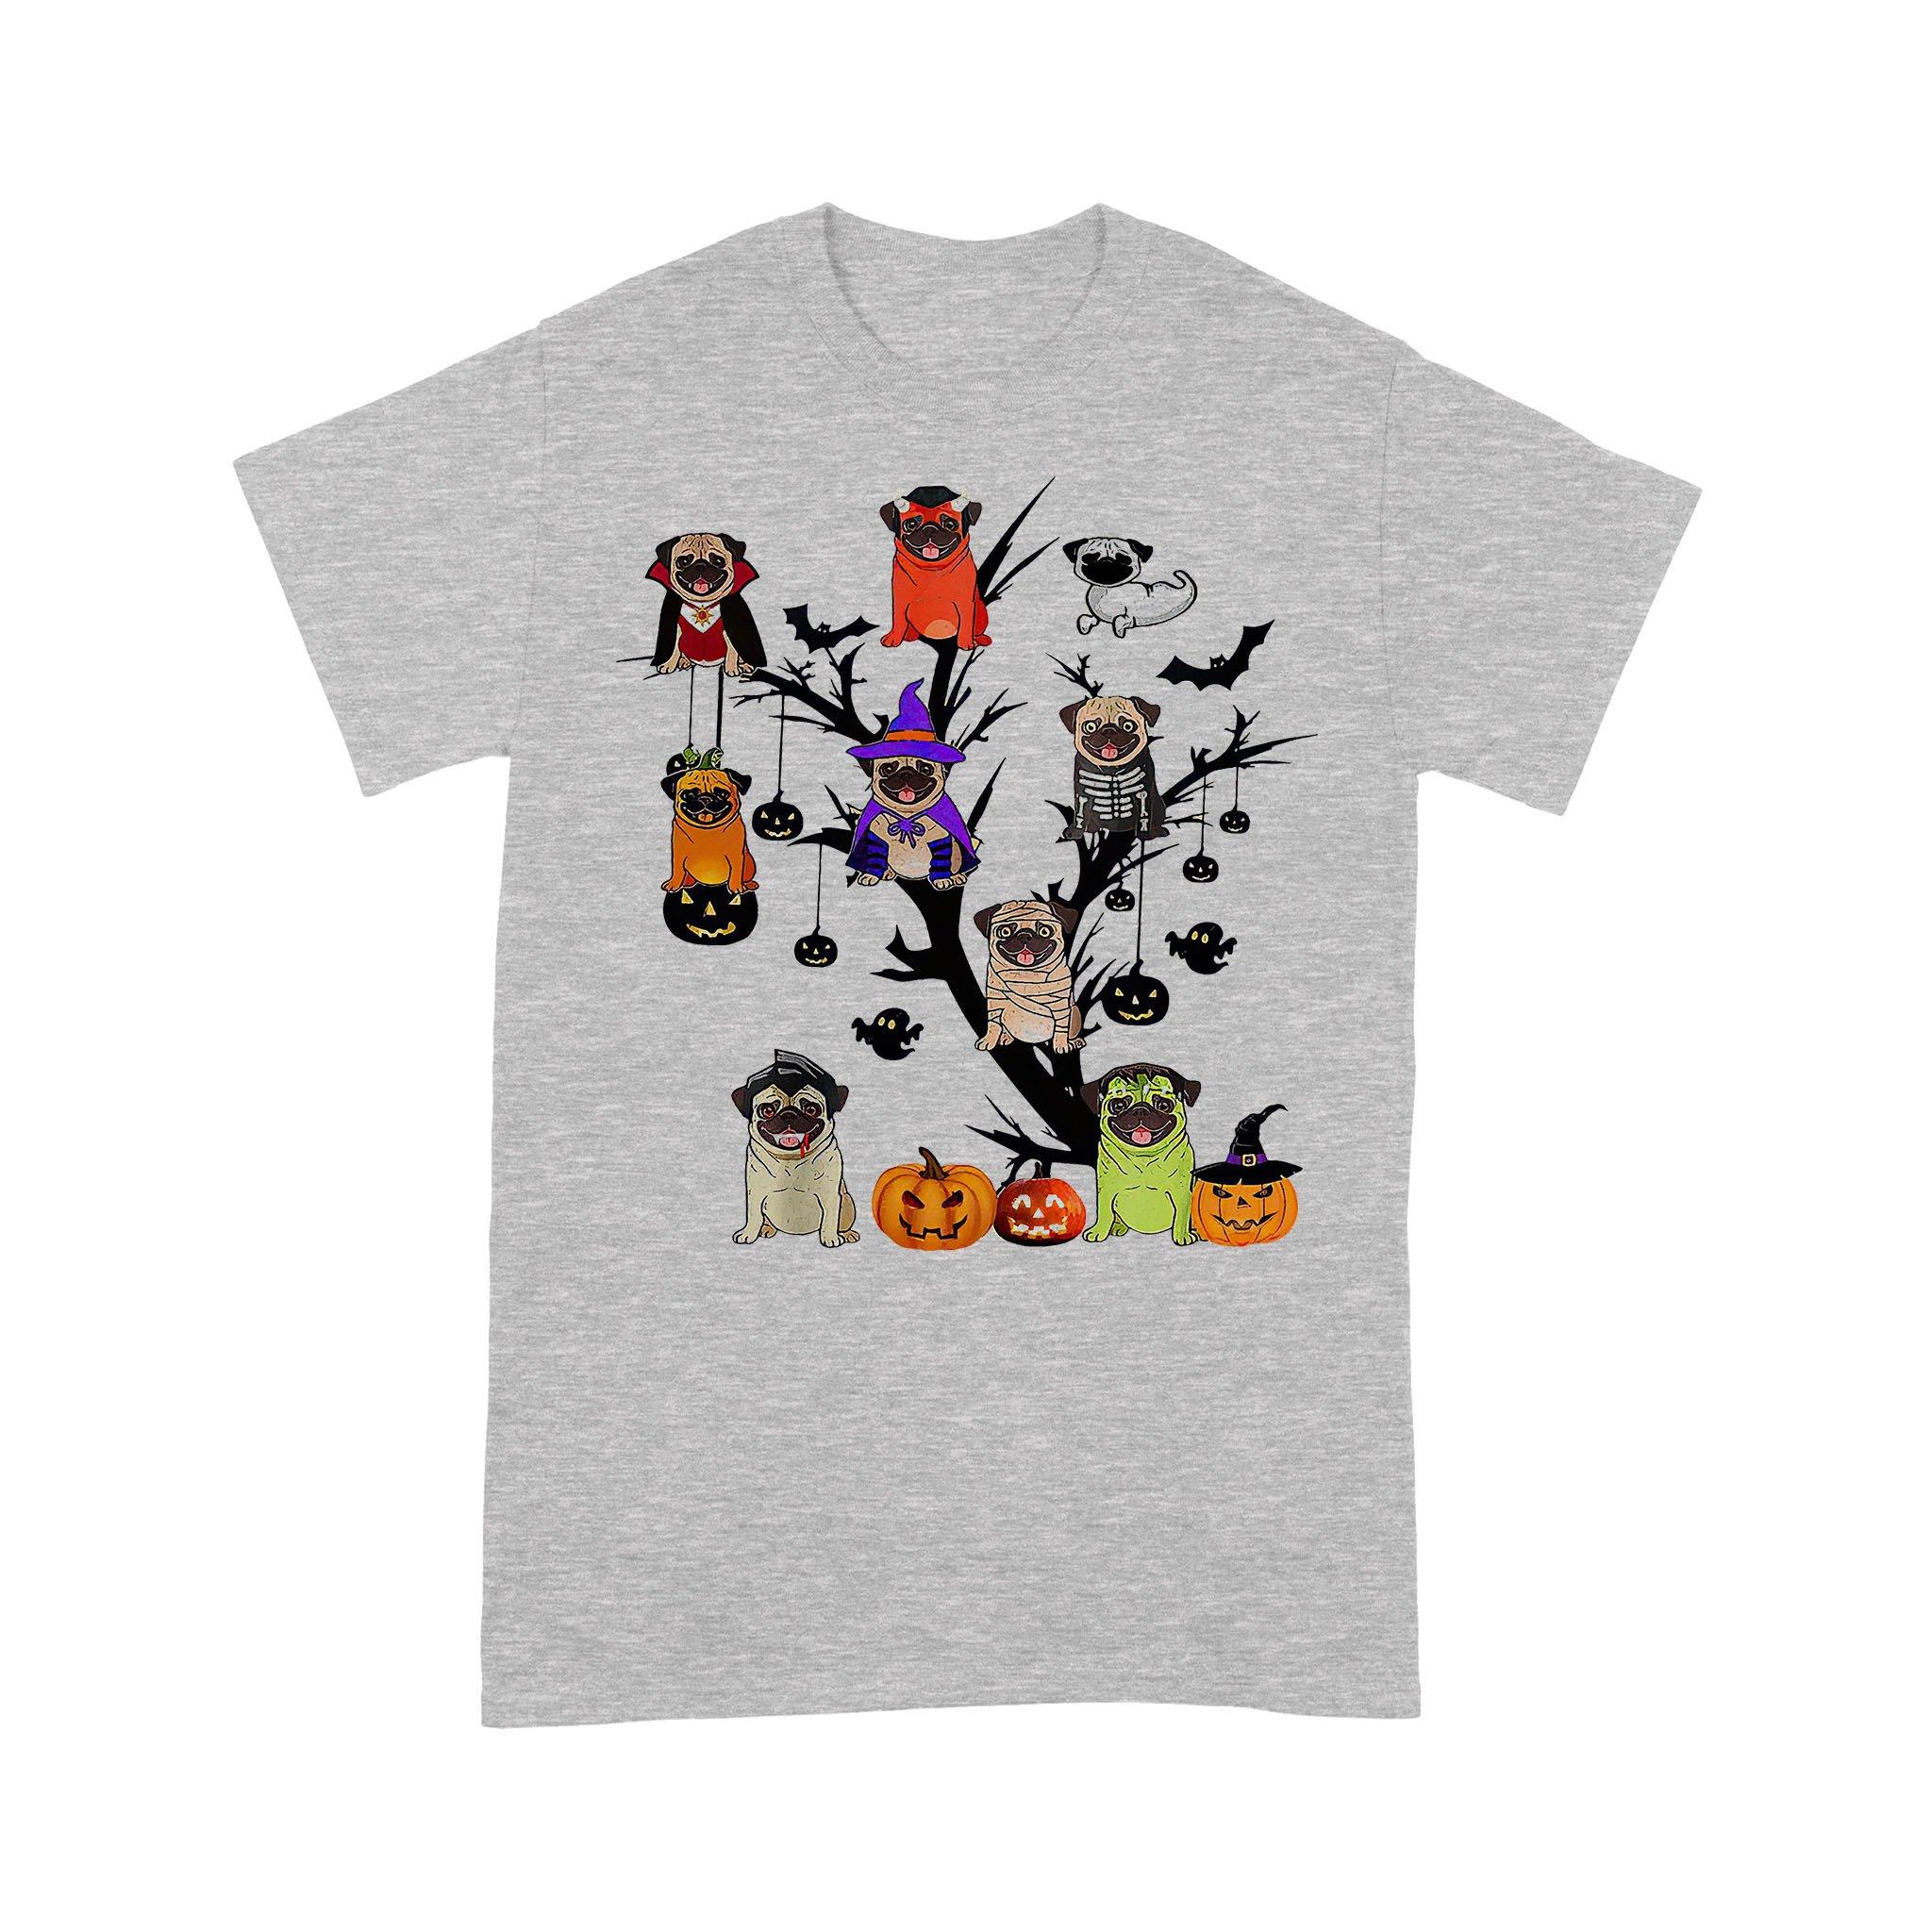 Pug Dog Halloween Tree T-shirt